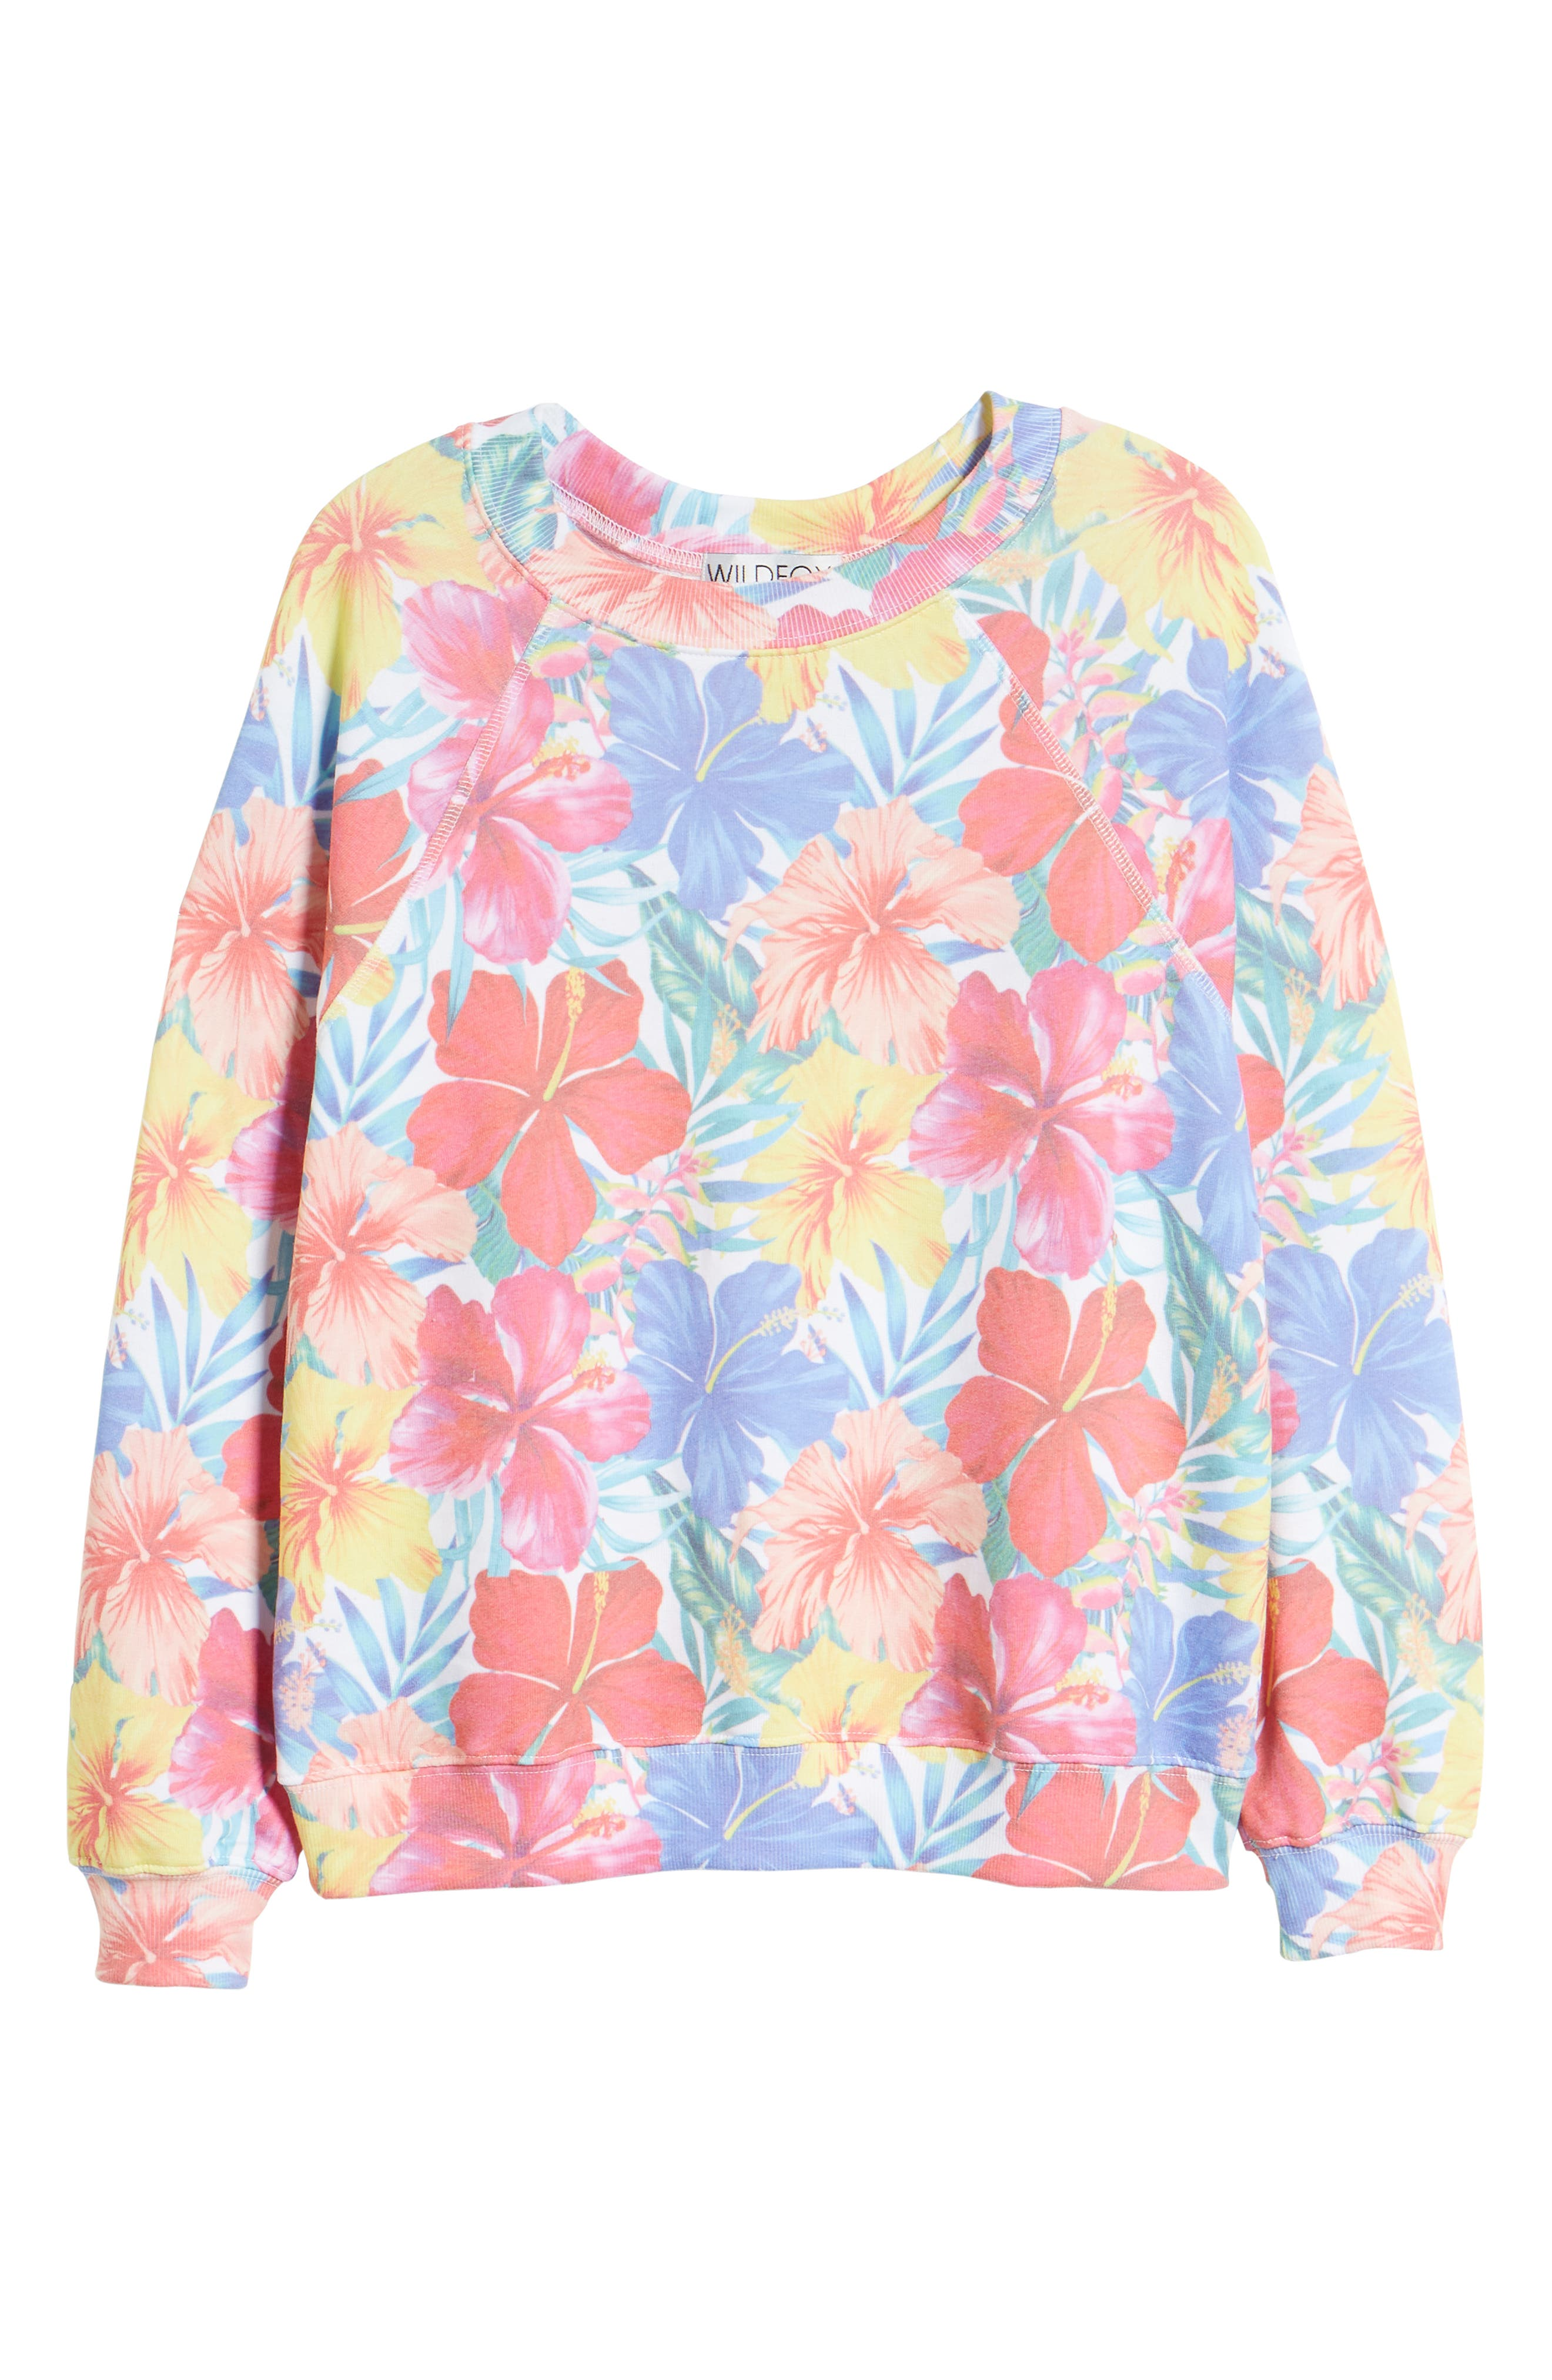 Tropicalia Sommers Sweatshirt,                             Alternate thumbnail 6, color,                             Multi Colored